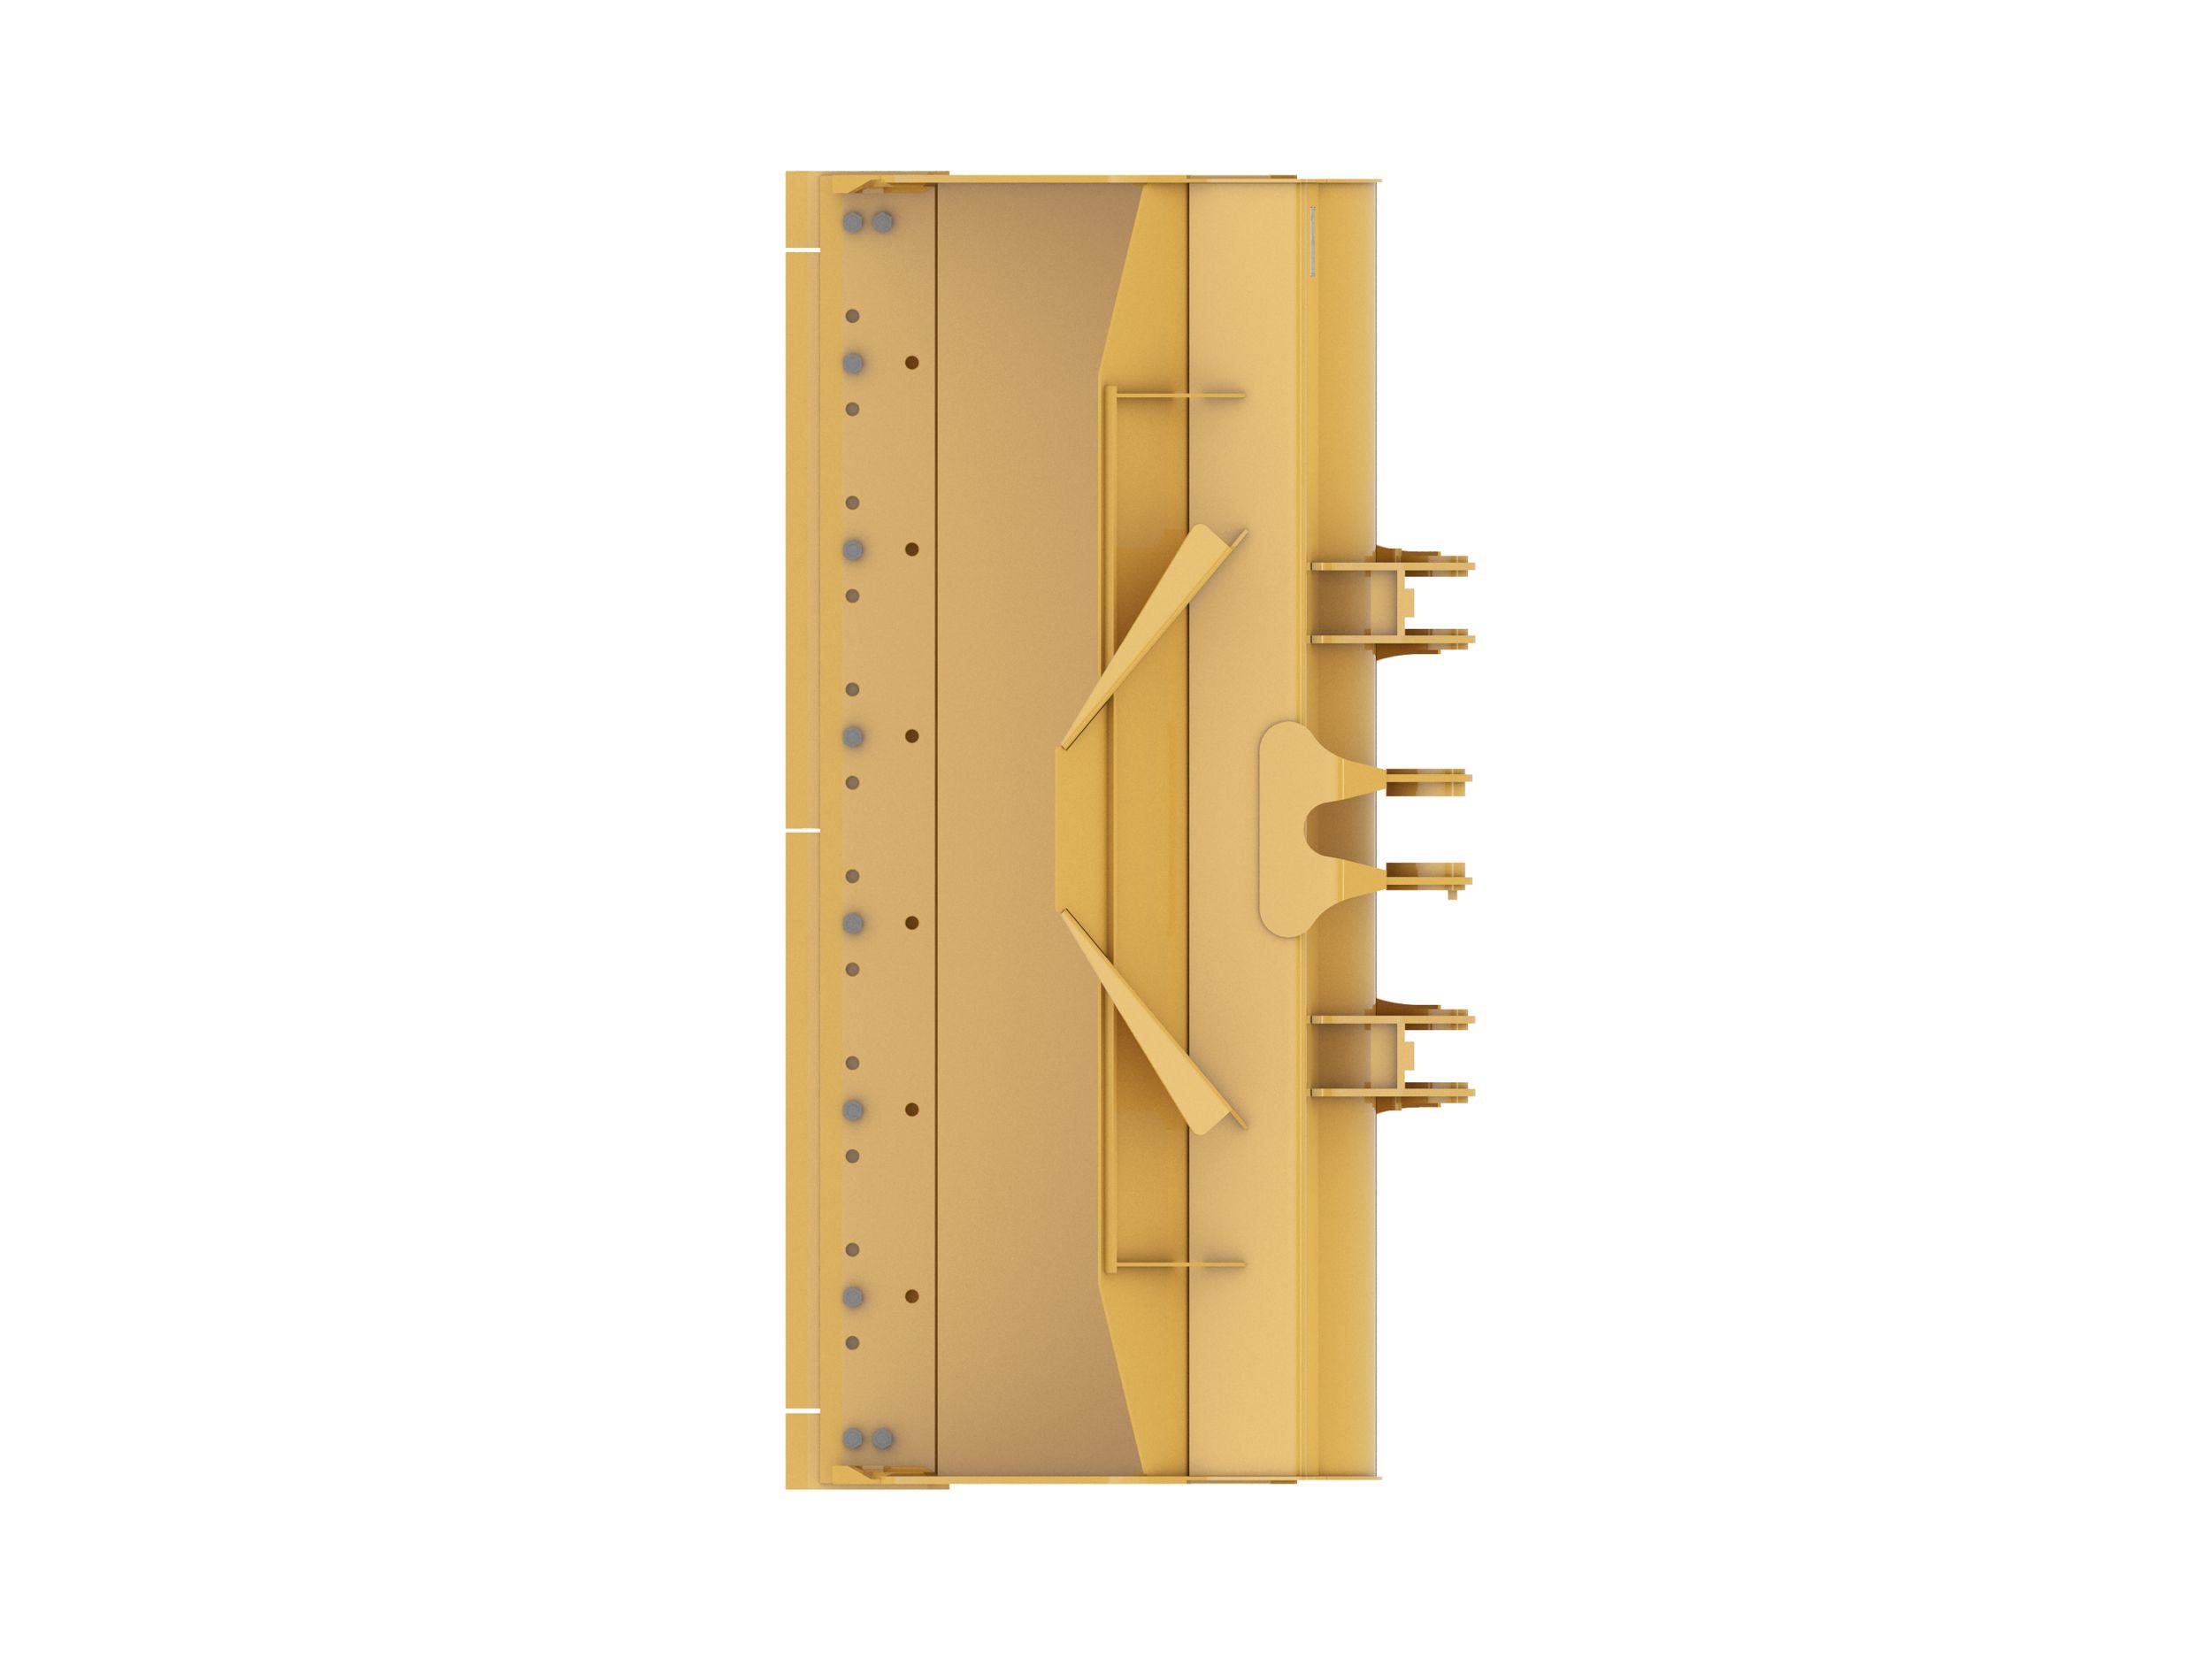 Gallery 2.7 m3 (3.5 yd3), Pin On, Bolt-On Cutting Edge